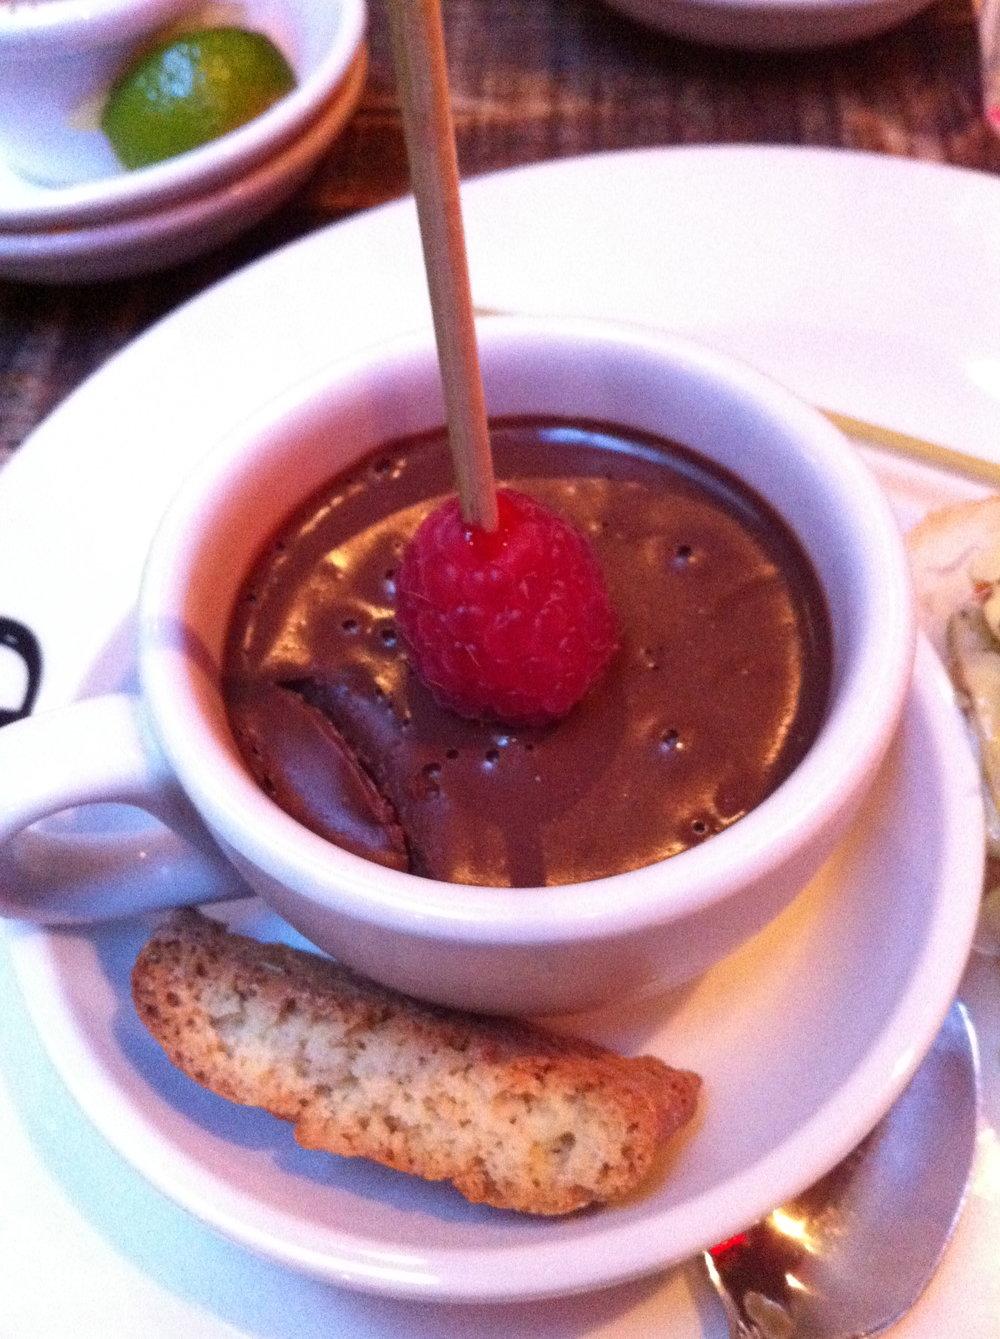 Chocolate mousse at Pix Pintxos Covent Garden